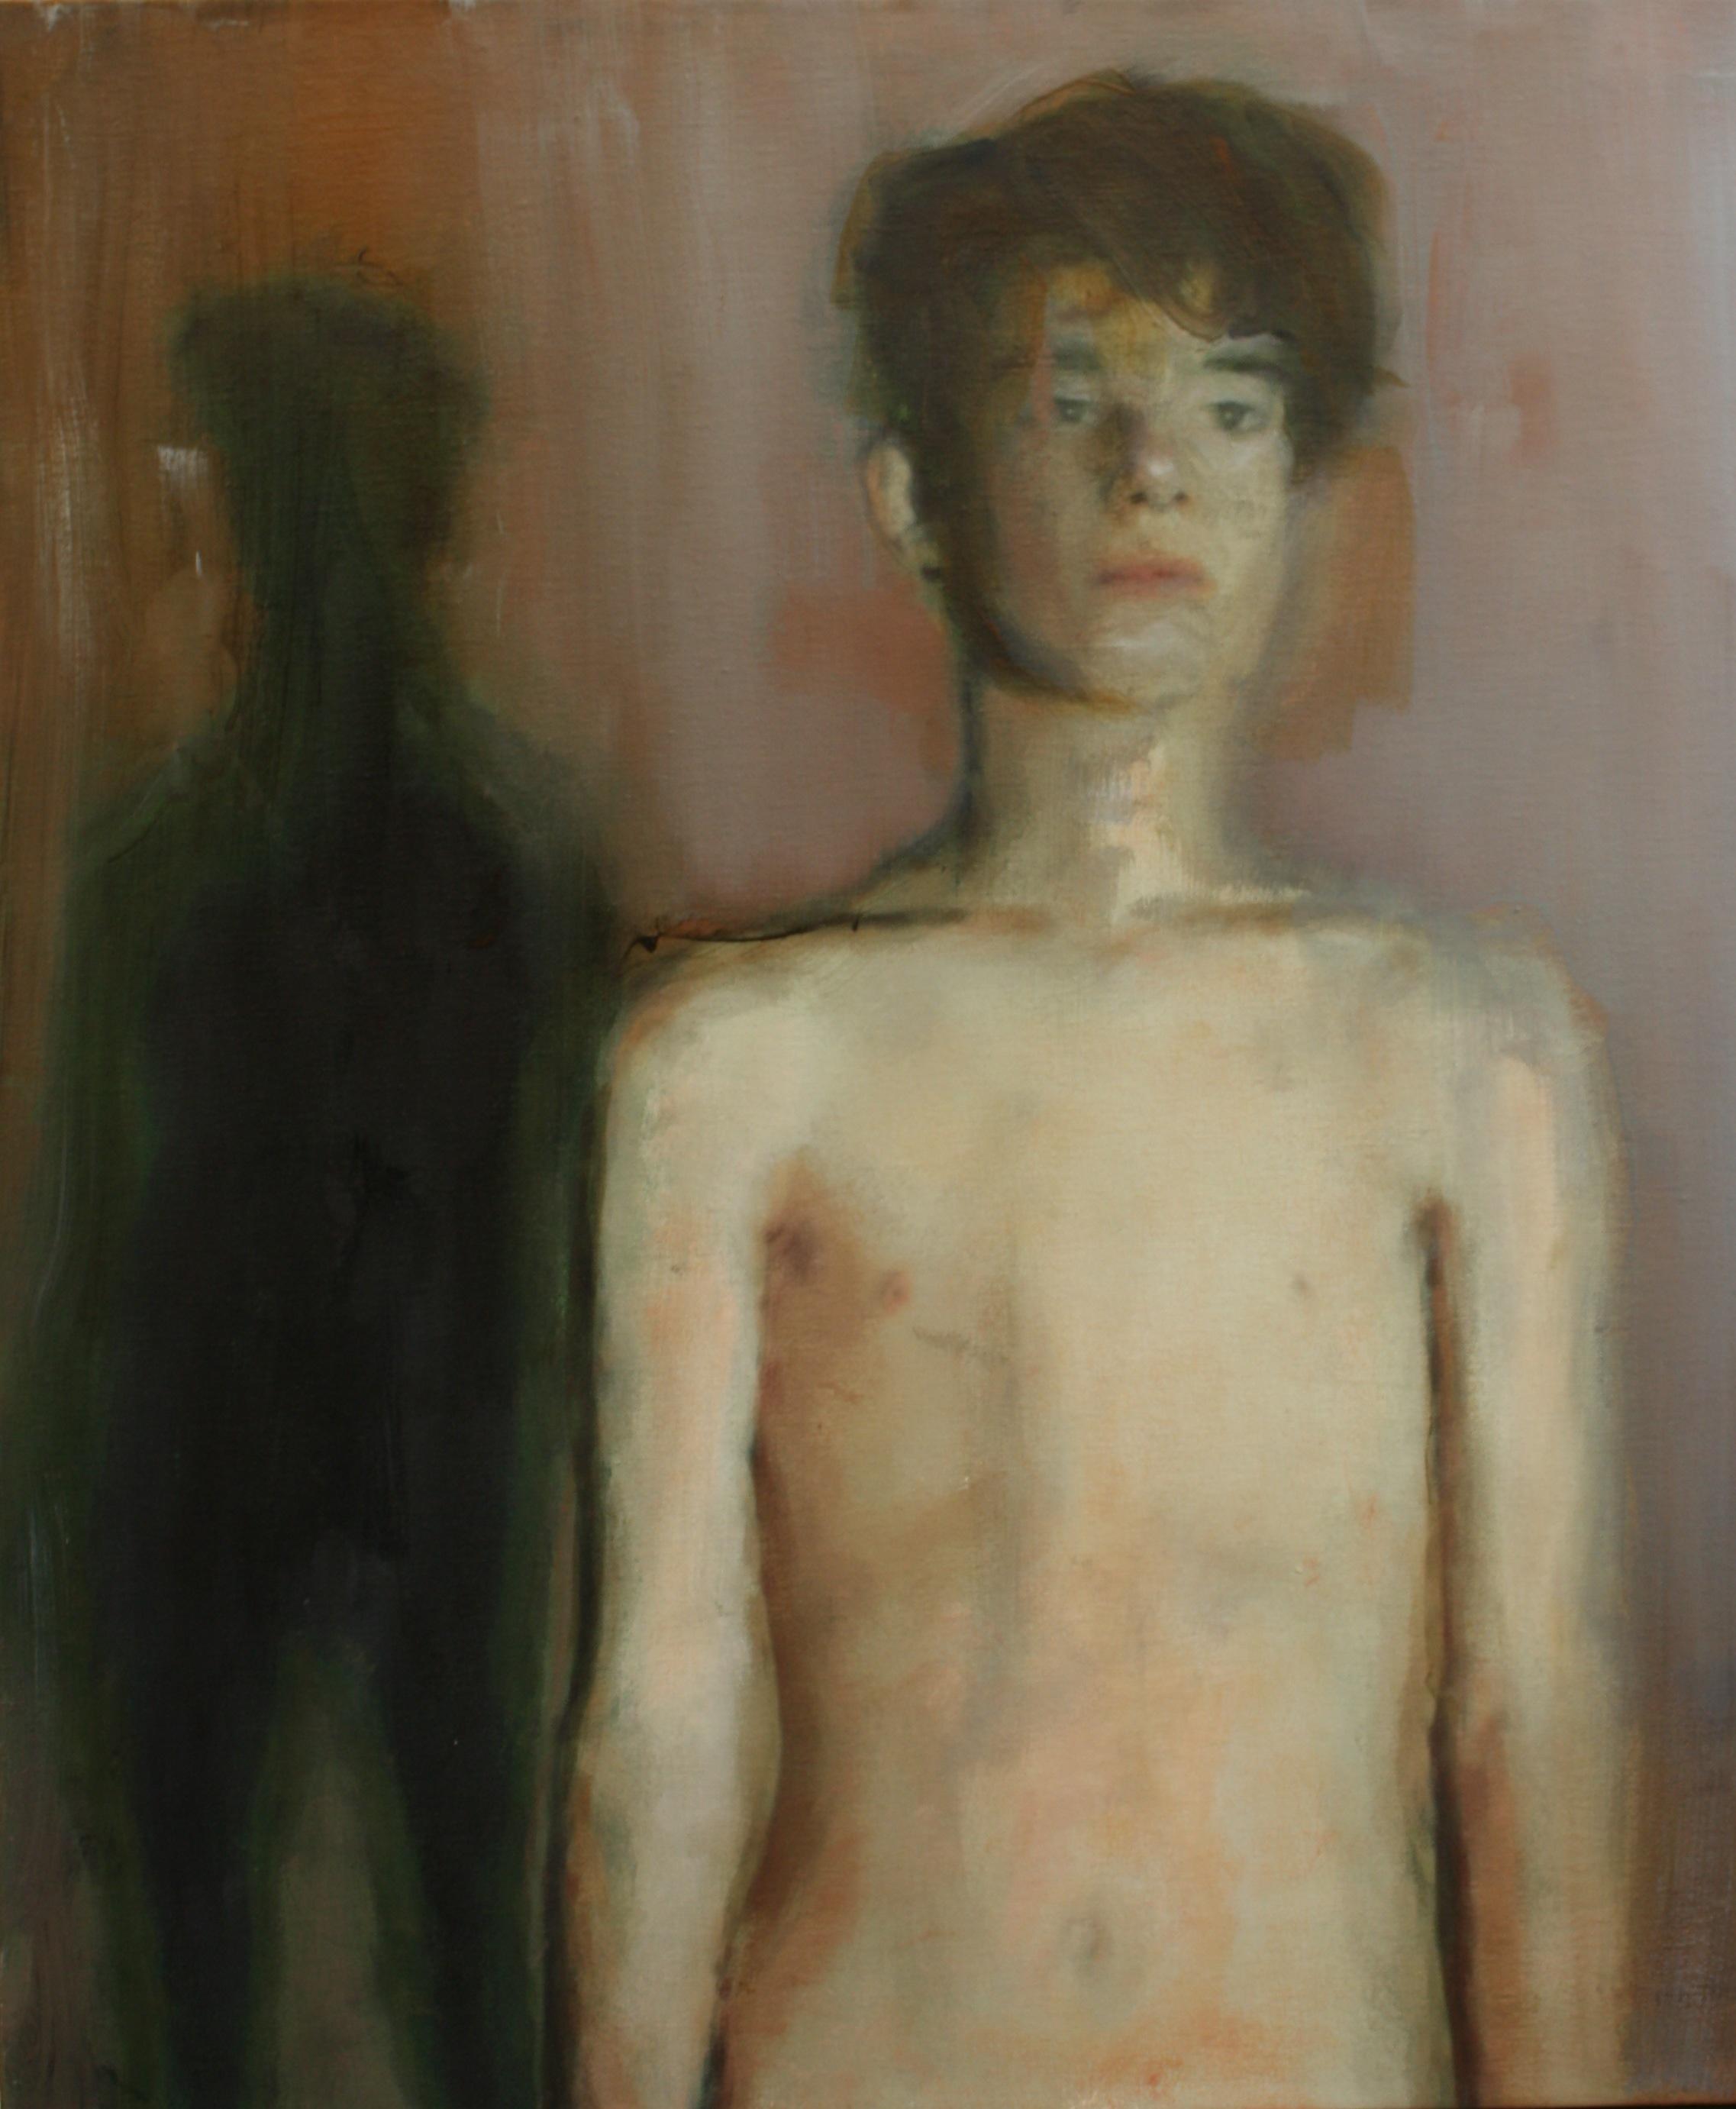 Untitled, 2009 Oil on canvas on wood 60 x 50 cm